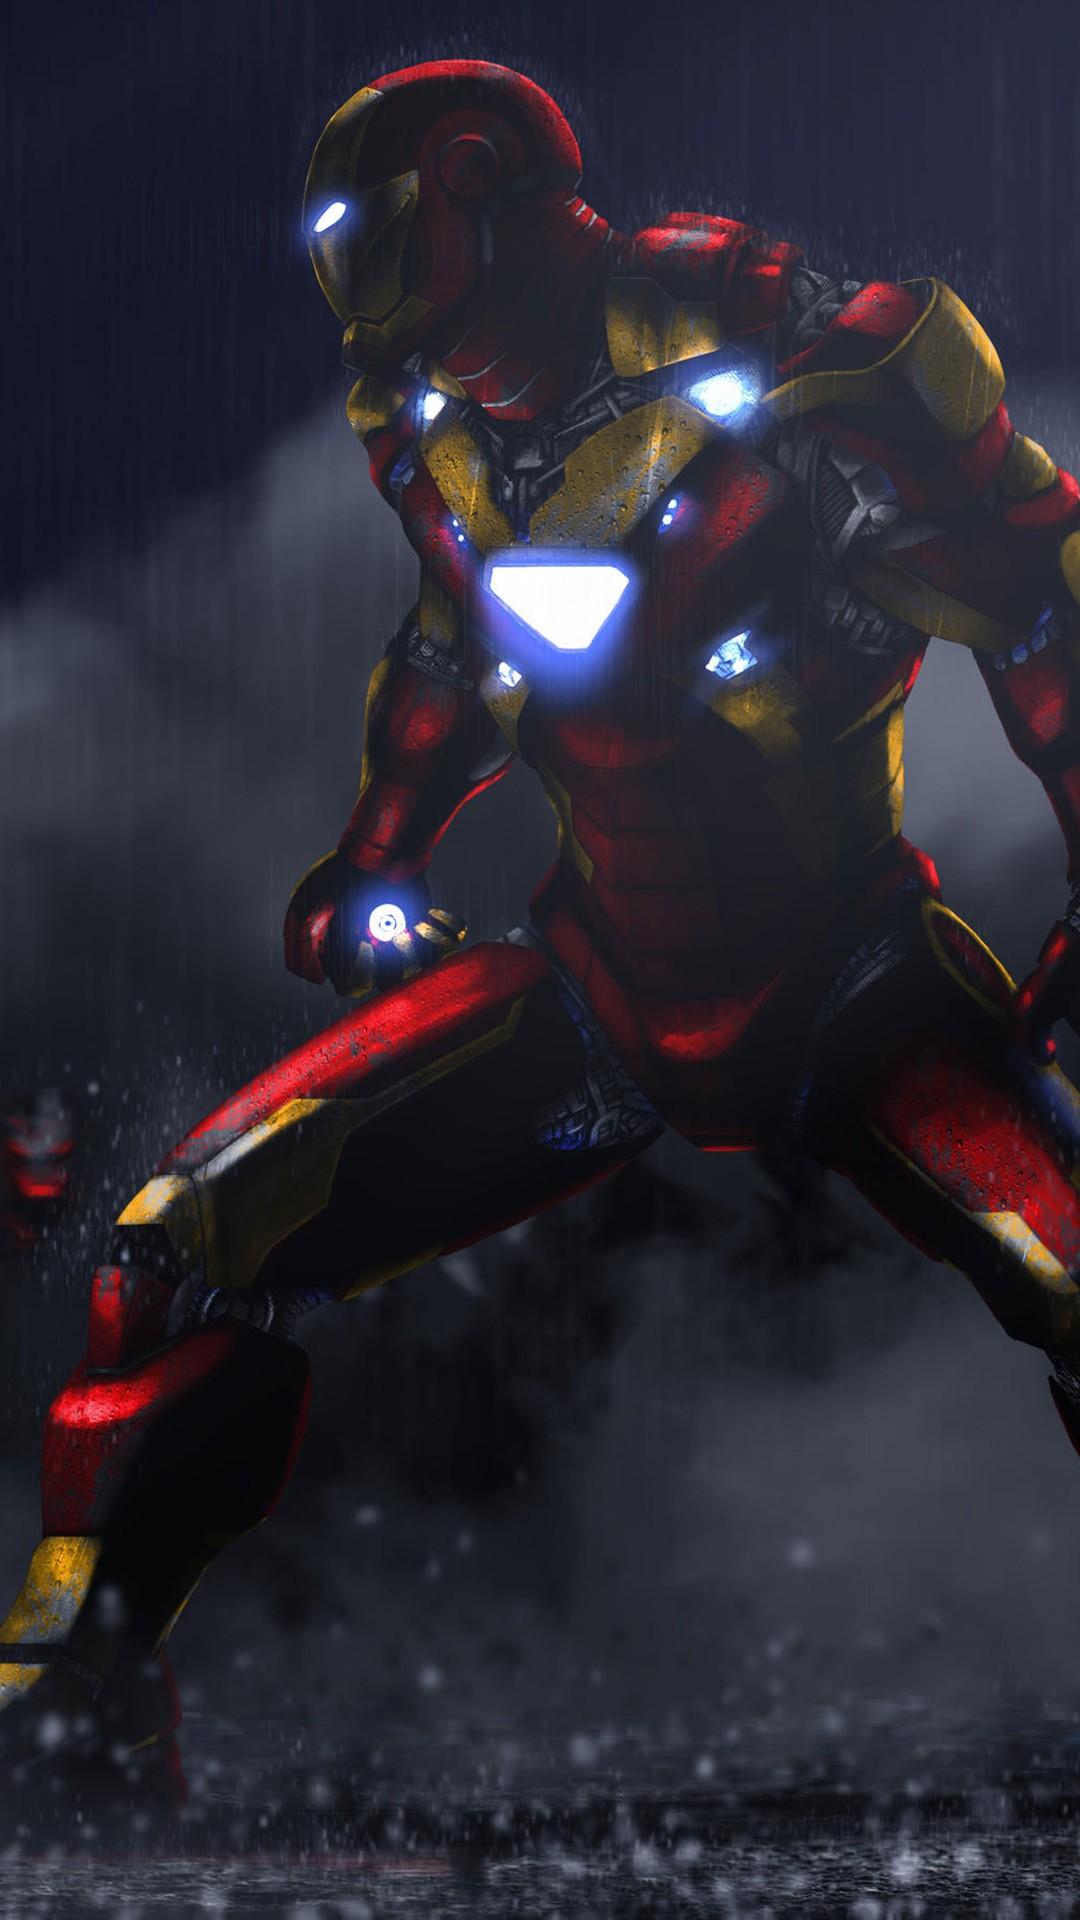 Iron Man 3d Wallpaper Android Iron Man Vs Ultron Sentries Wallpapers Hd Wallpapers